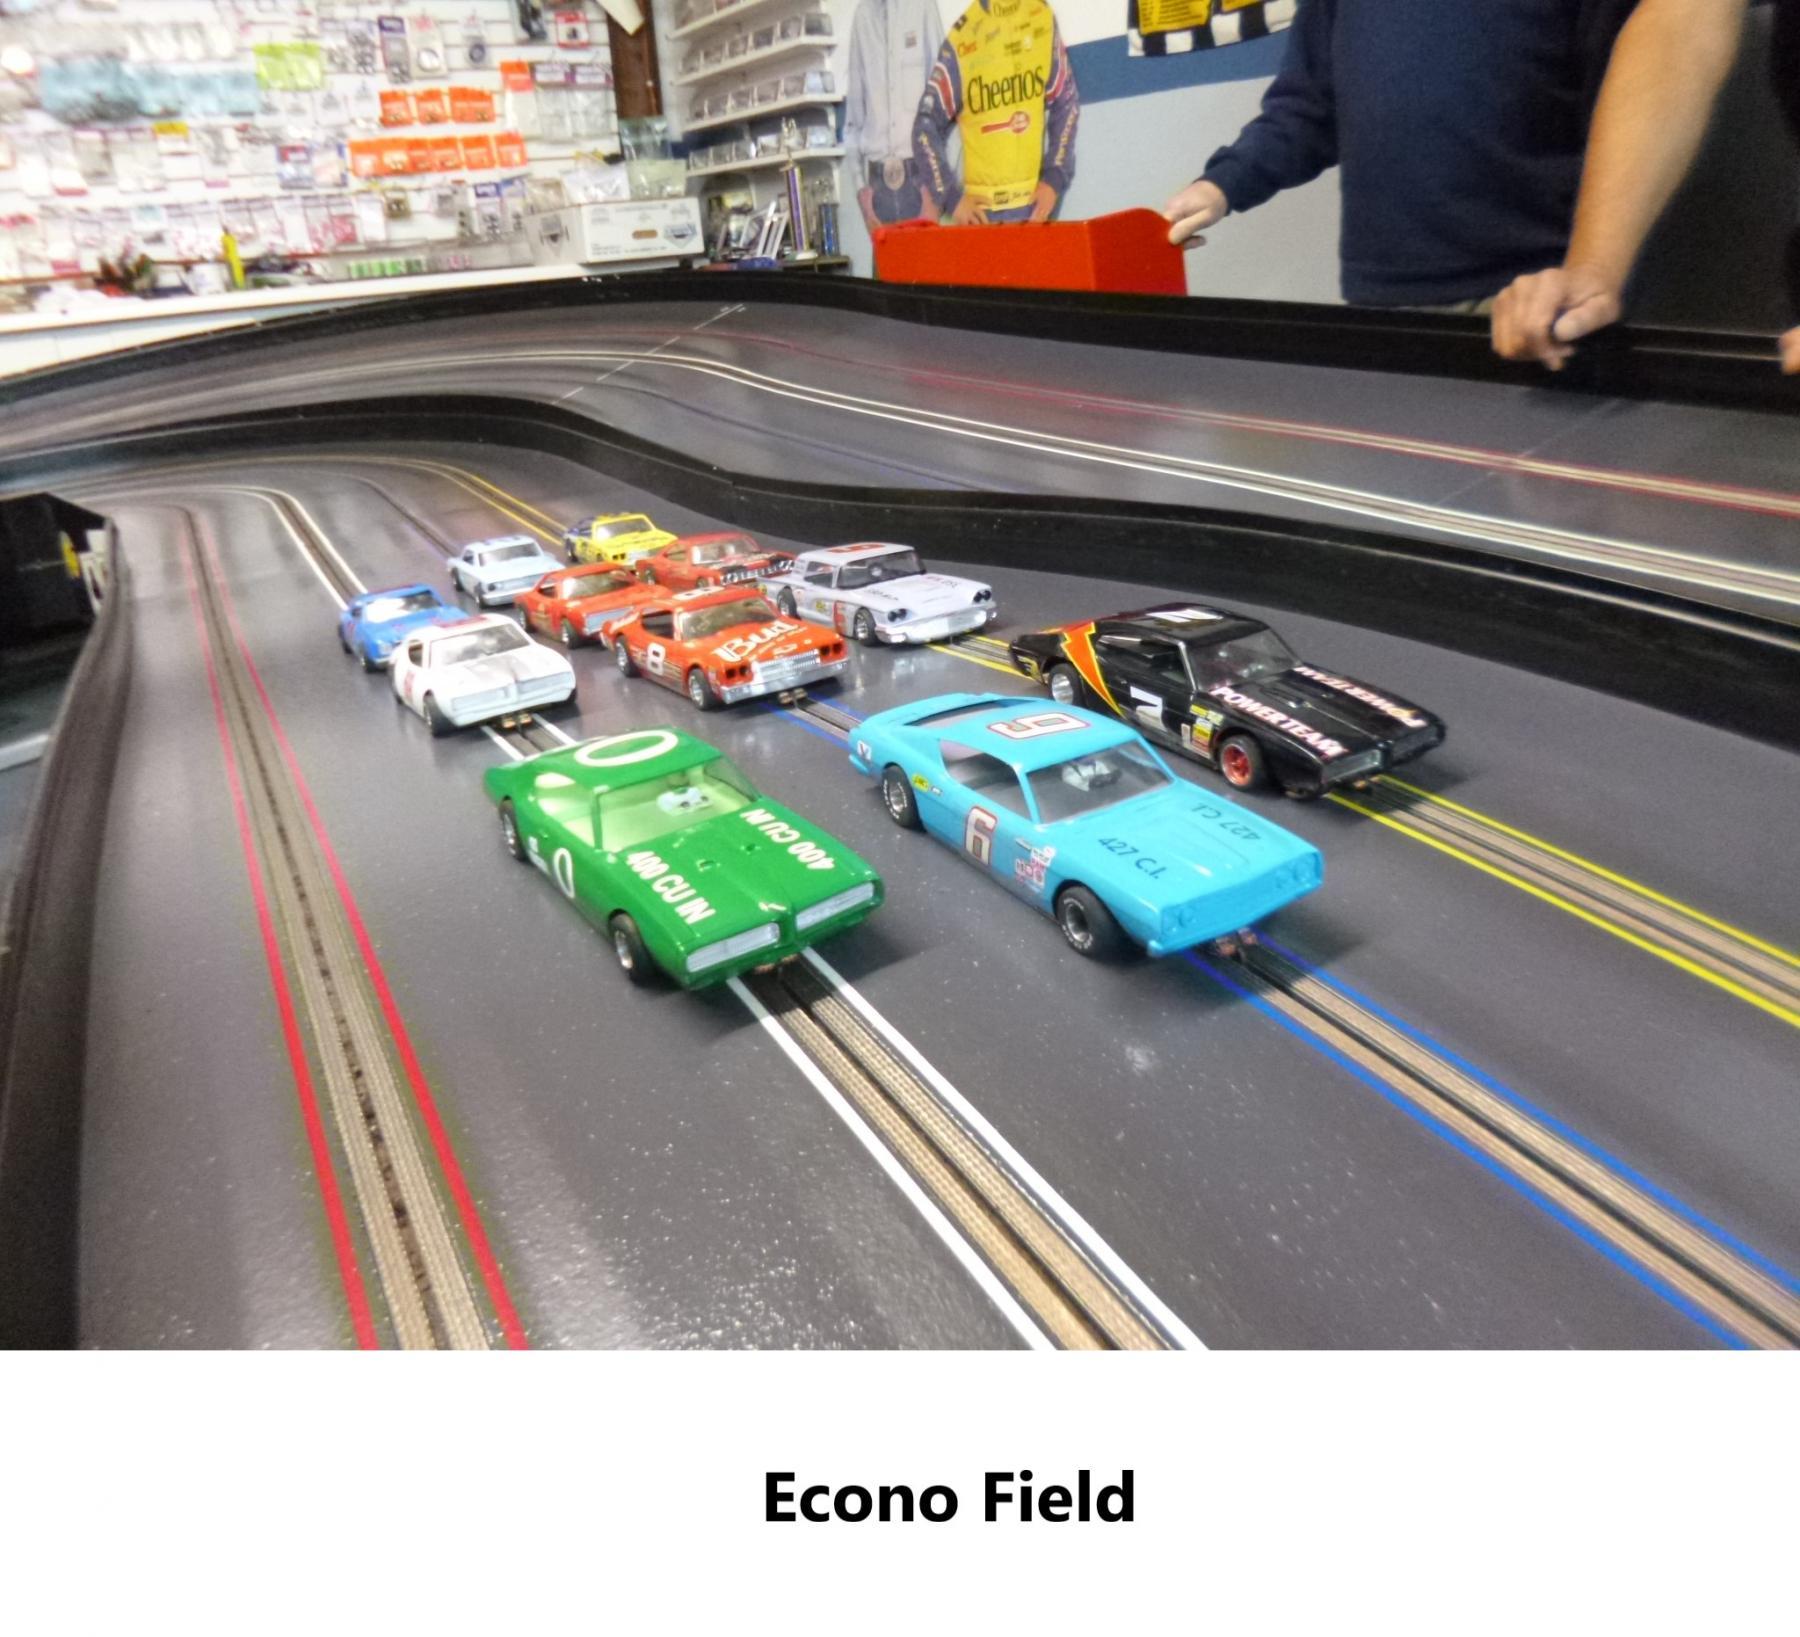 E_Field.jpg